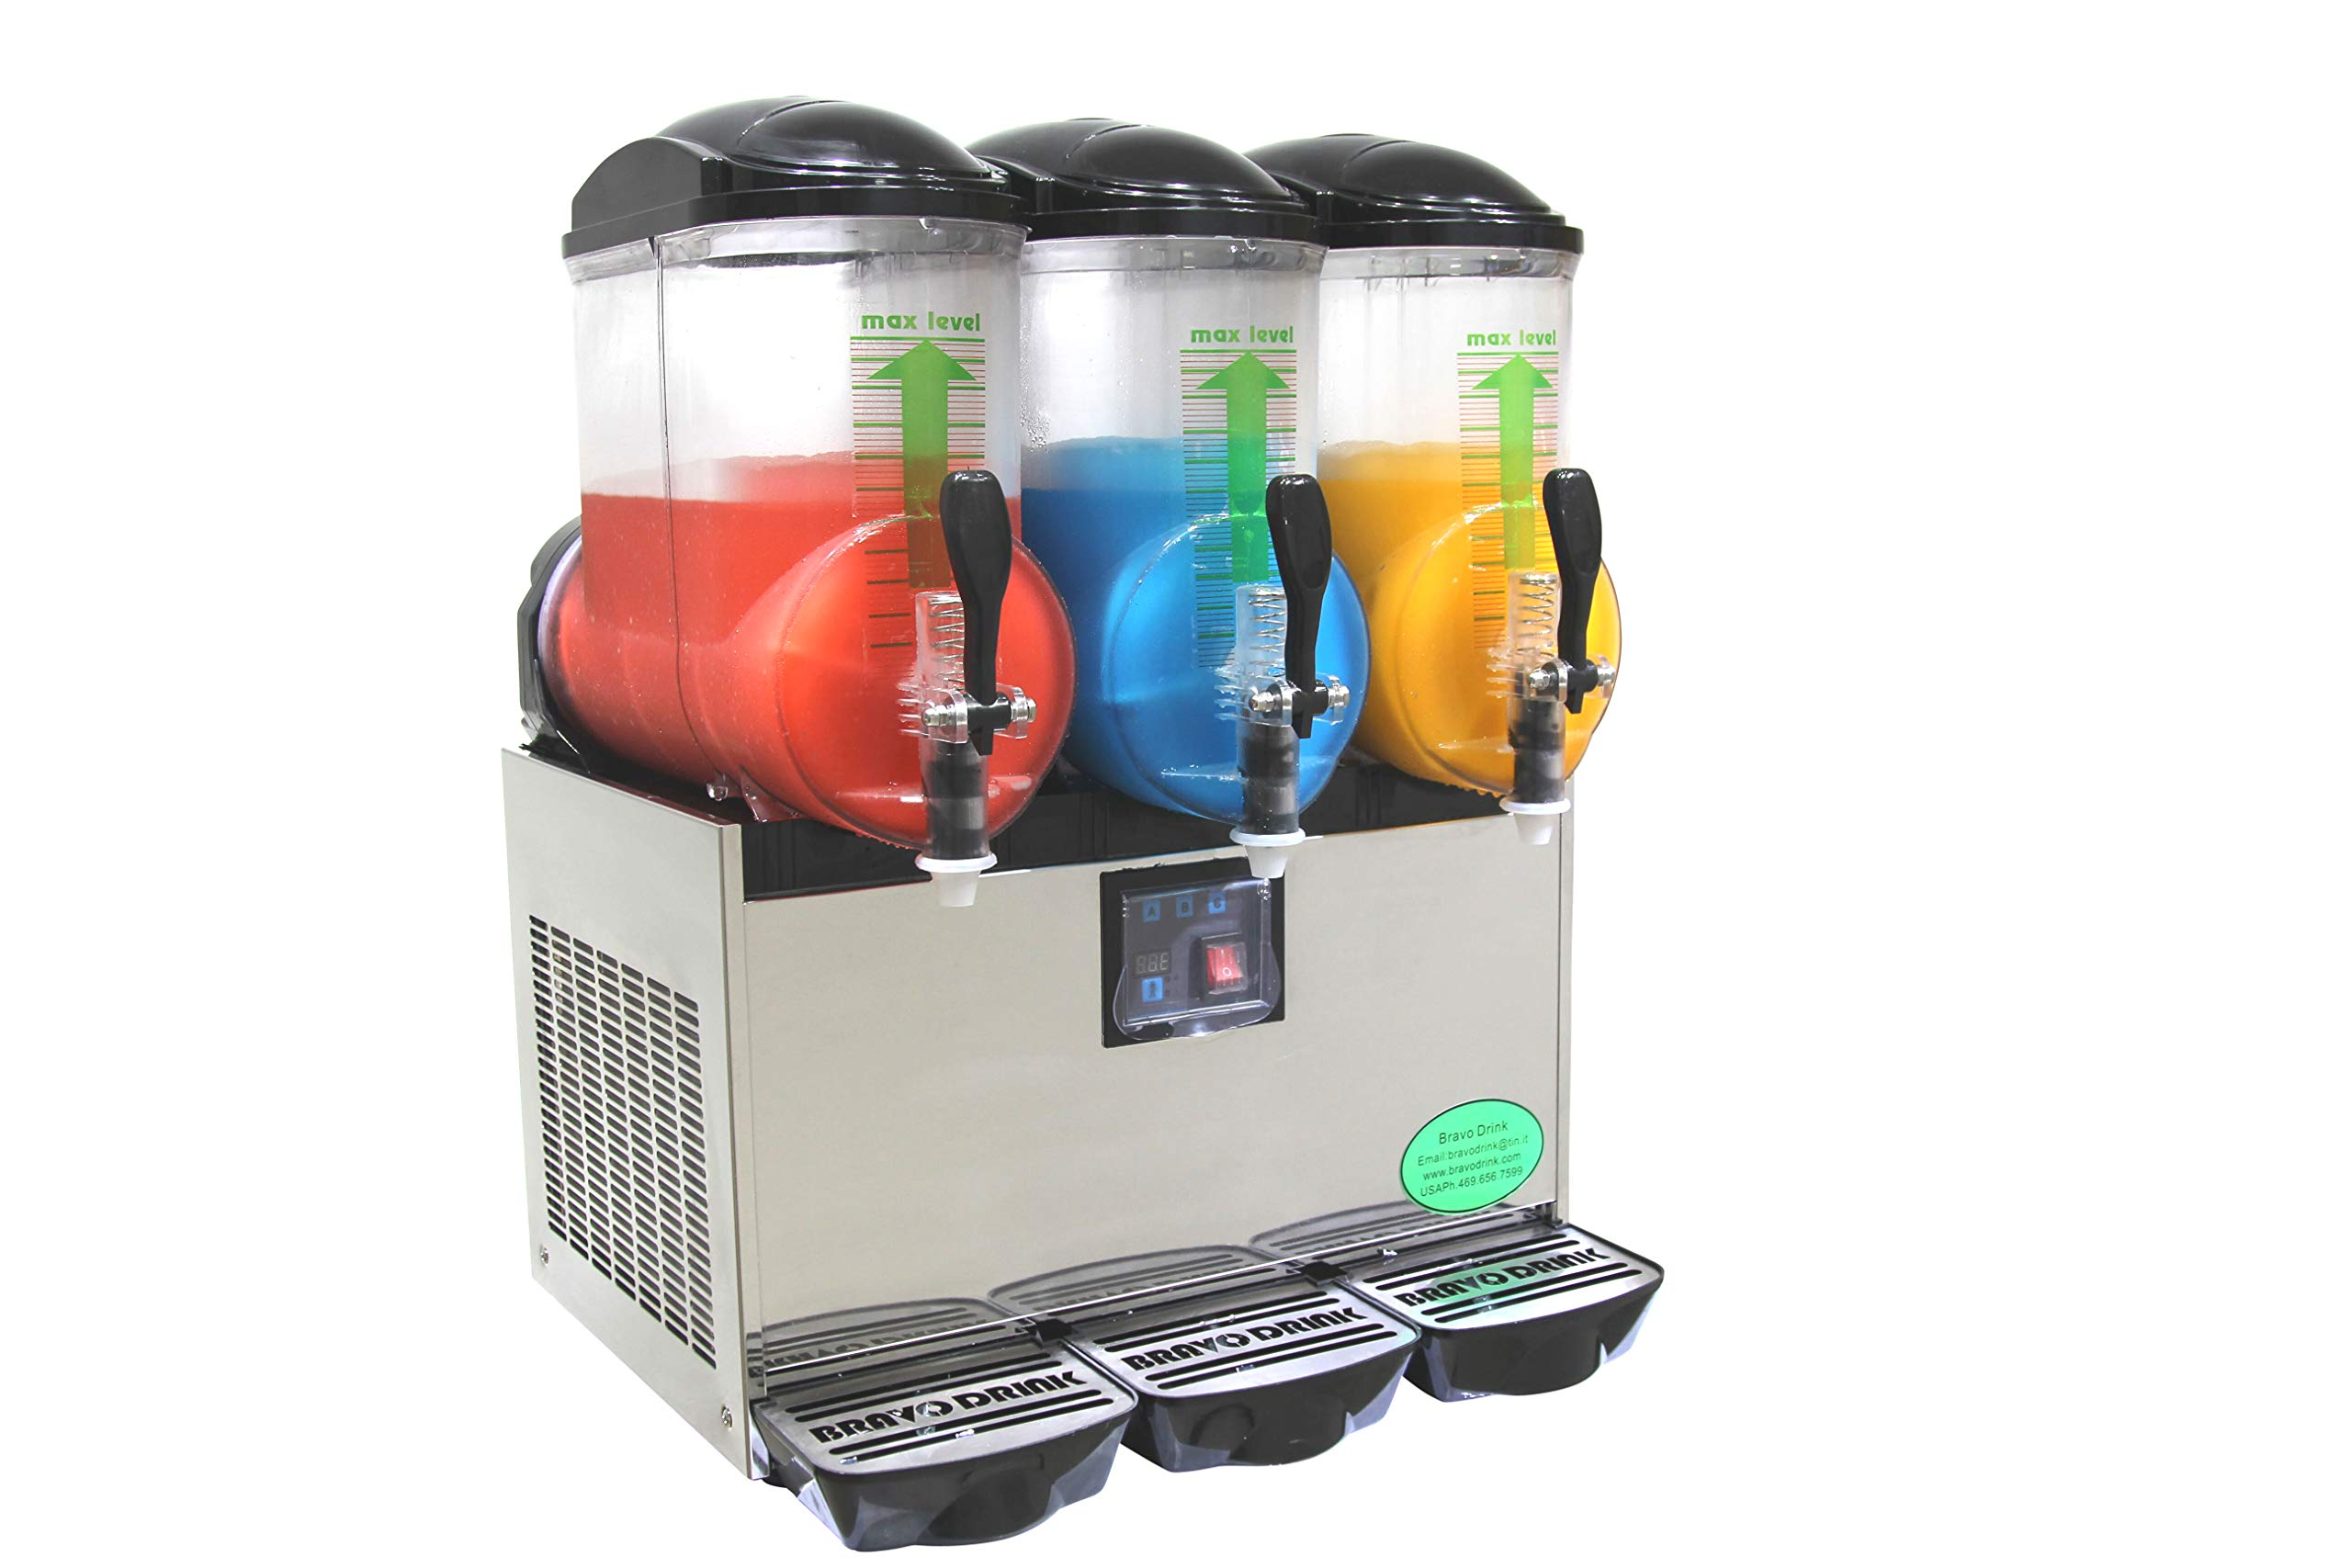 BRAVO ITALIA 3 BOWLS Slushie Machine, 3.2 gallons each bowl, 150 CUPS,COMMERCIAL GRADE.Slushy Machine, Slushy Maker, Margarita Machine by BRAVO ITALIA